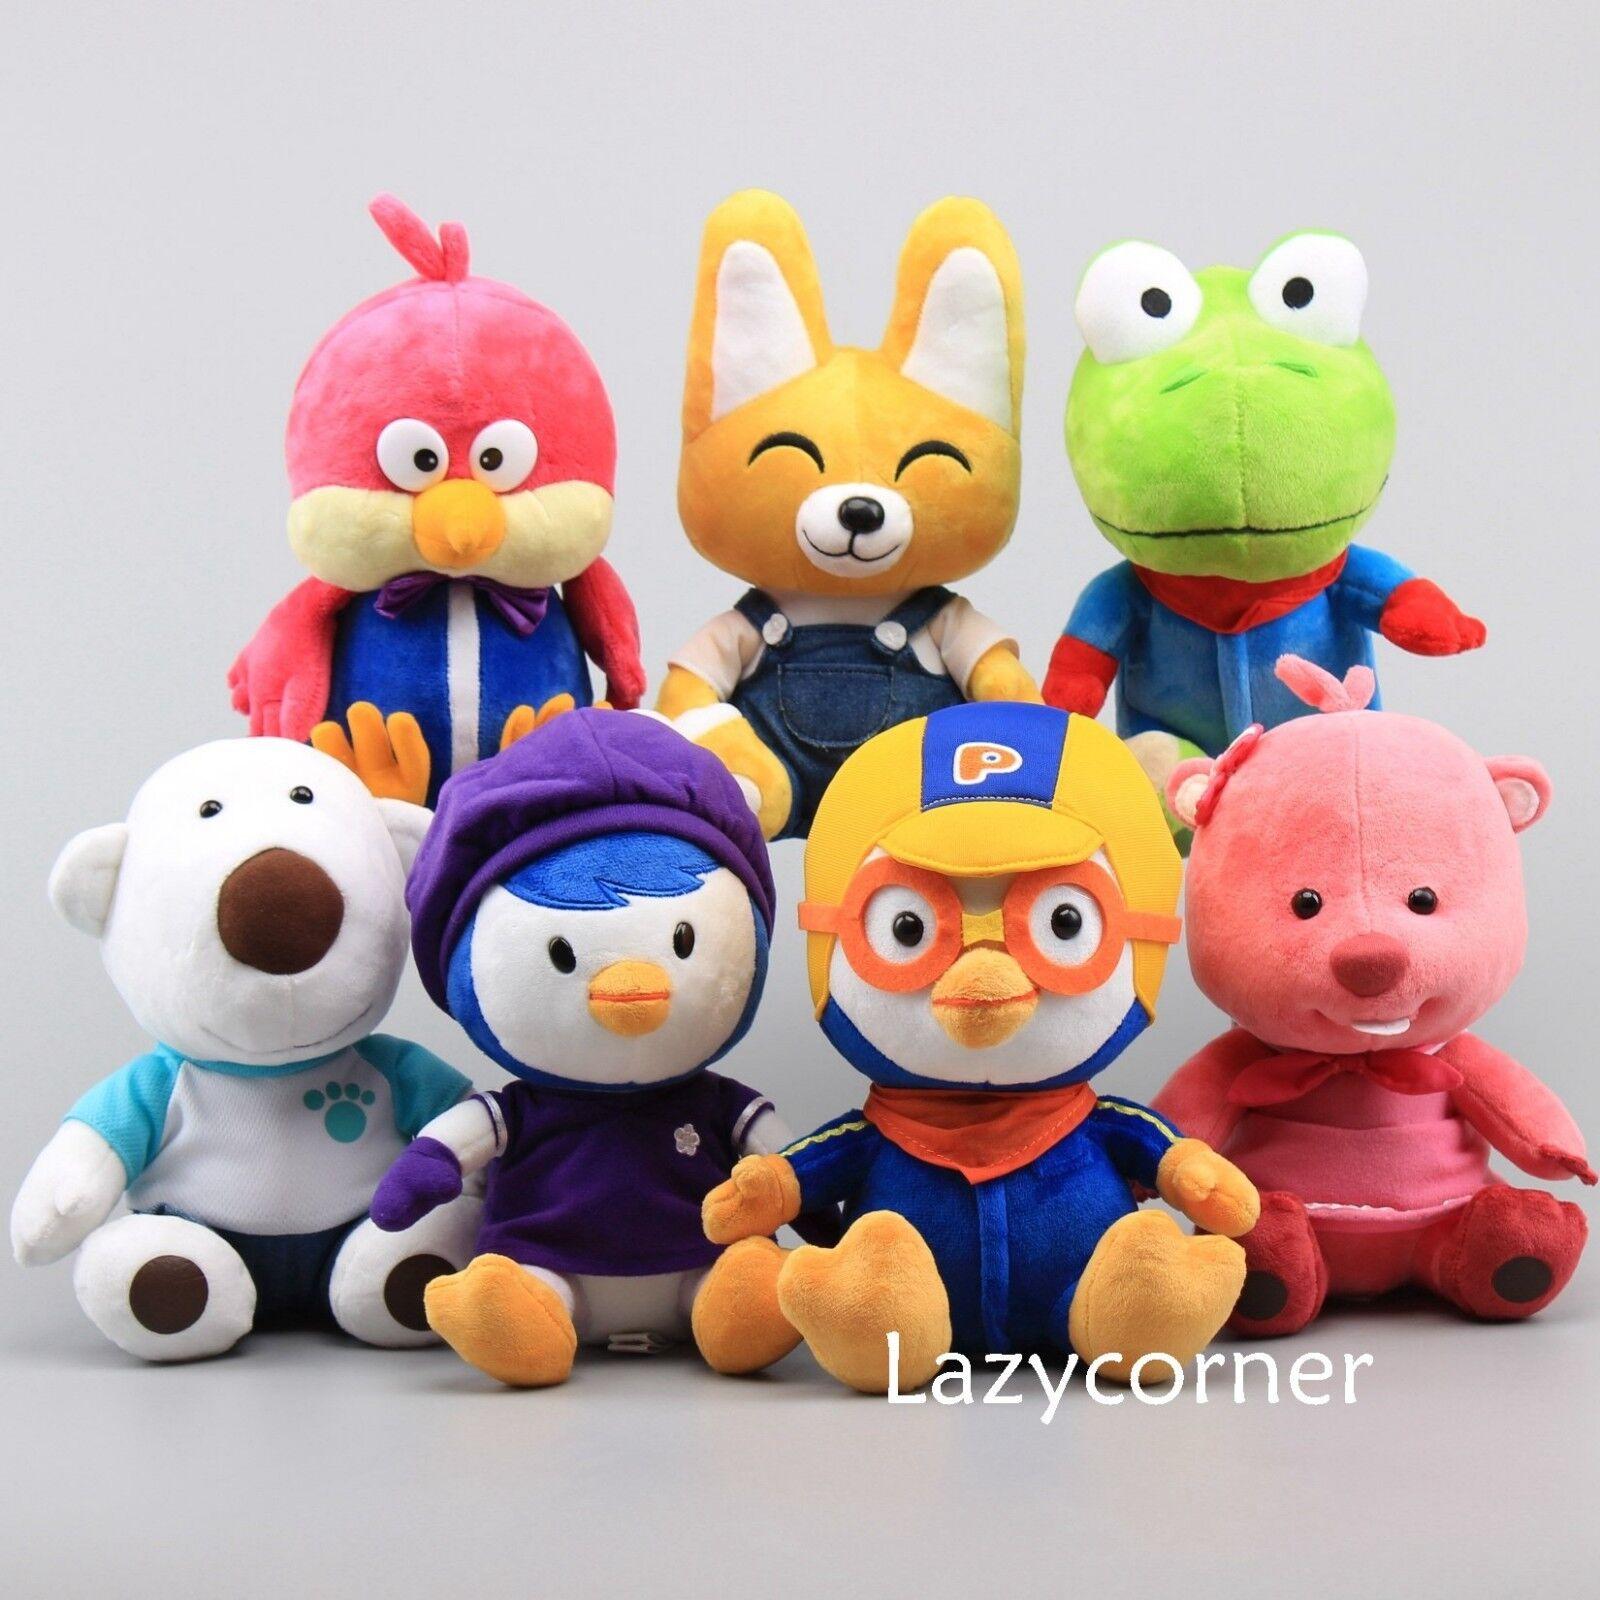 Korea Pguldro Plush leksak Crong Eddy Loopy Petty Harry Poby Stufed djur Doll 9'